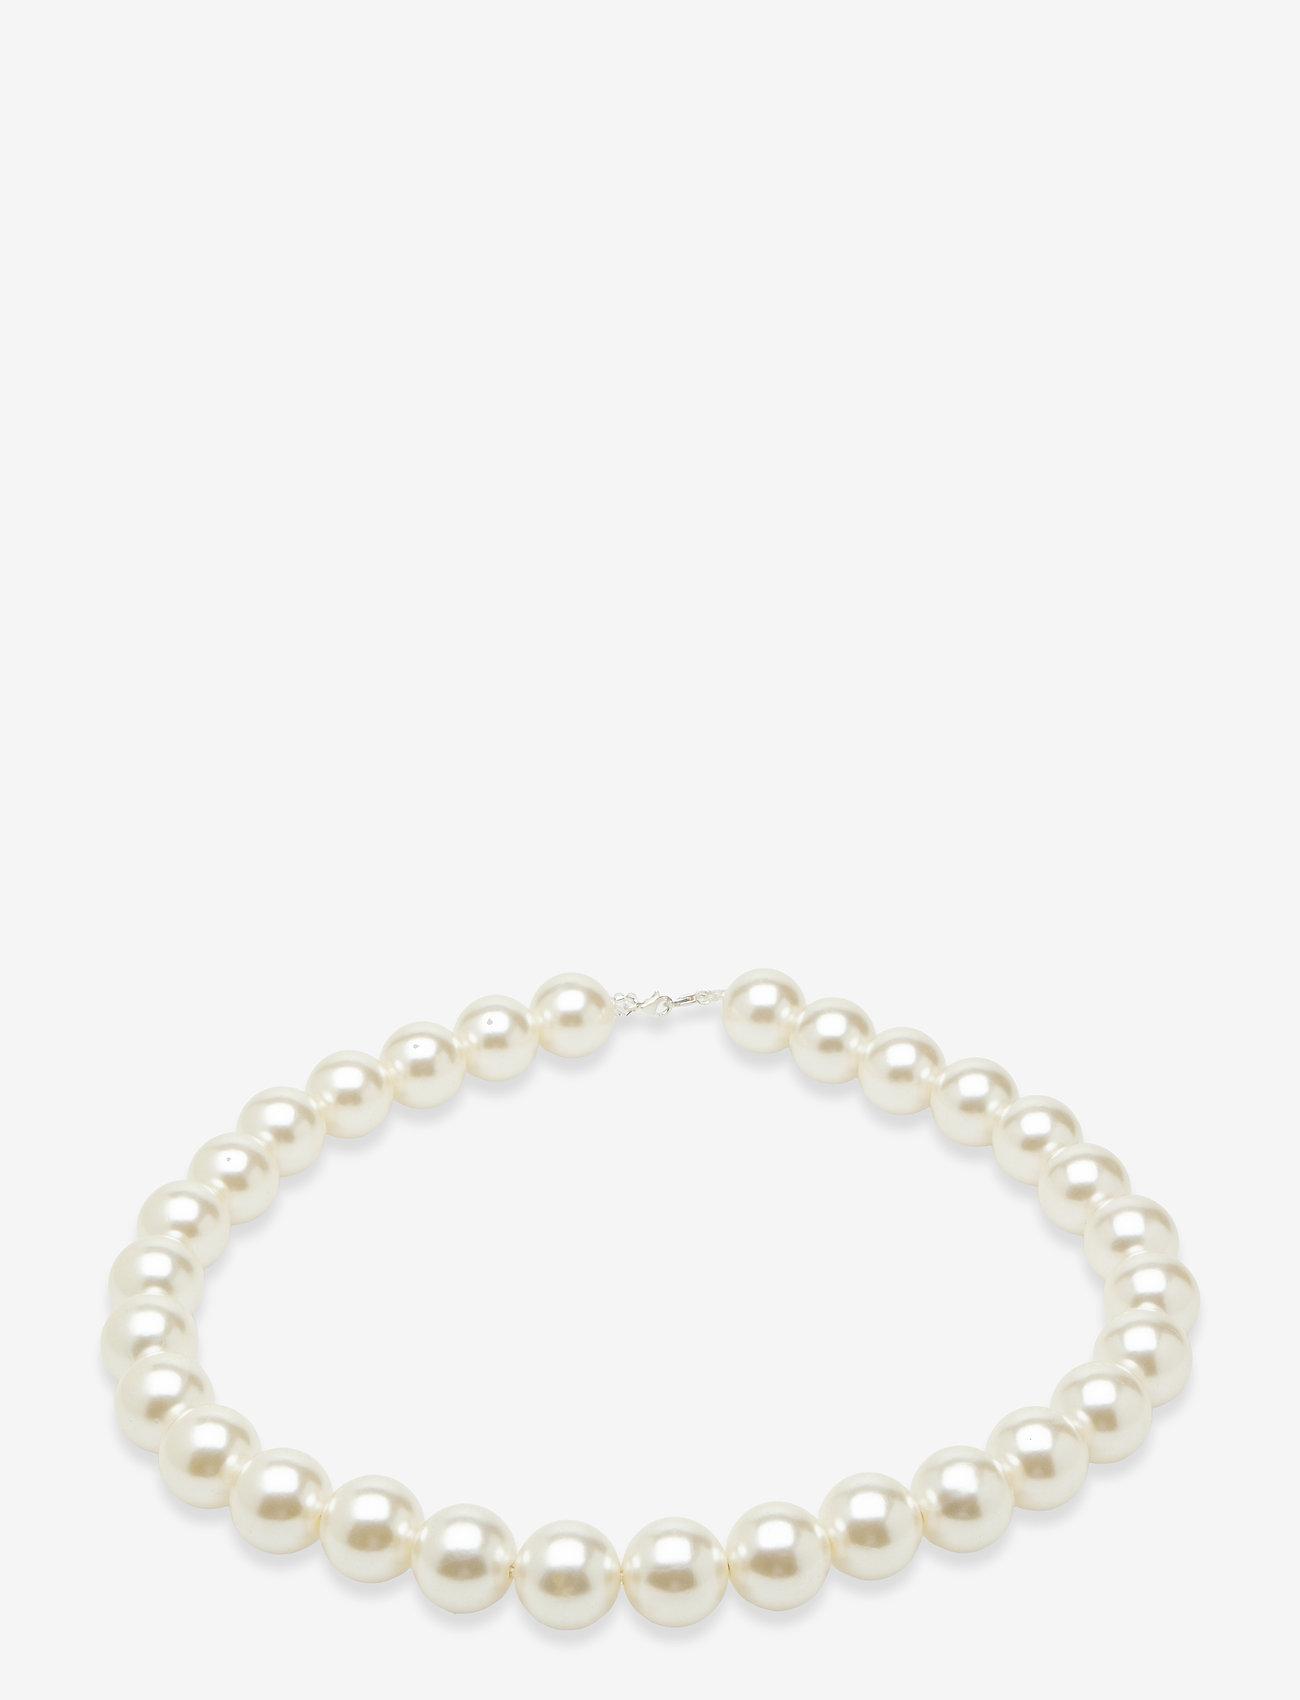 Custommade - Zerma Pearl - dainty - whisper white - 0